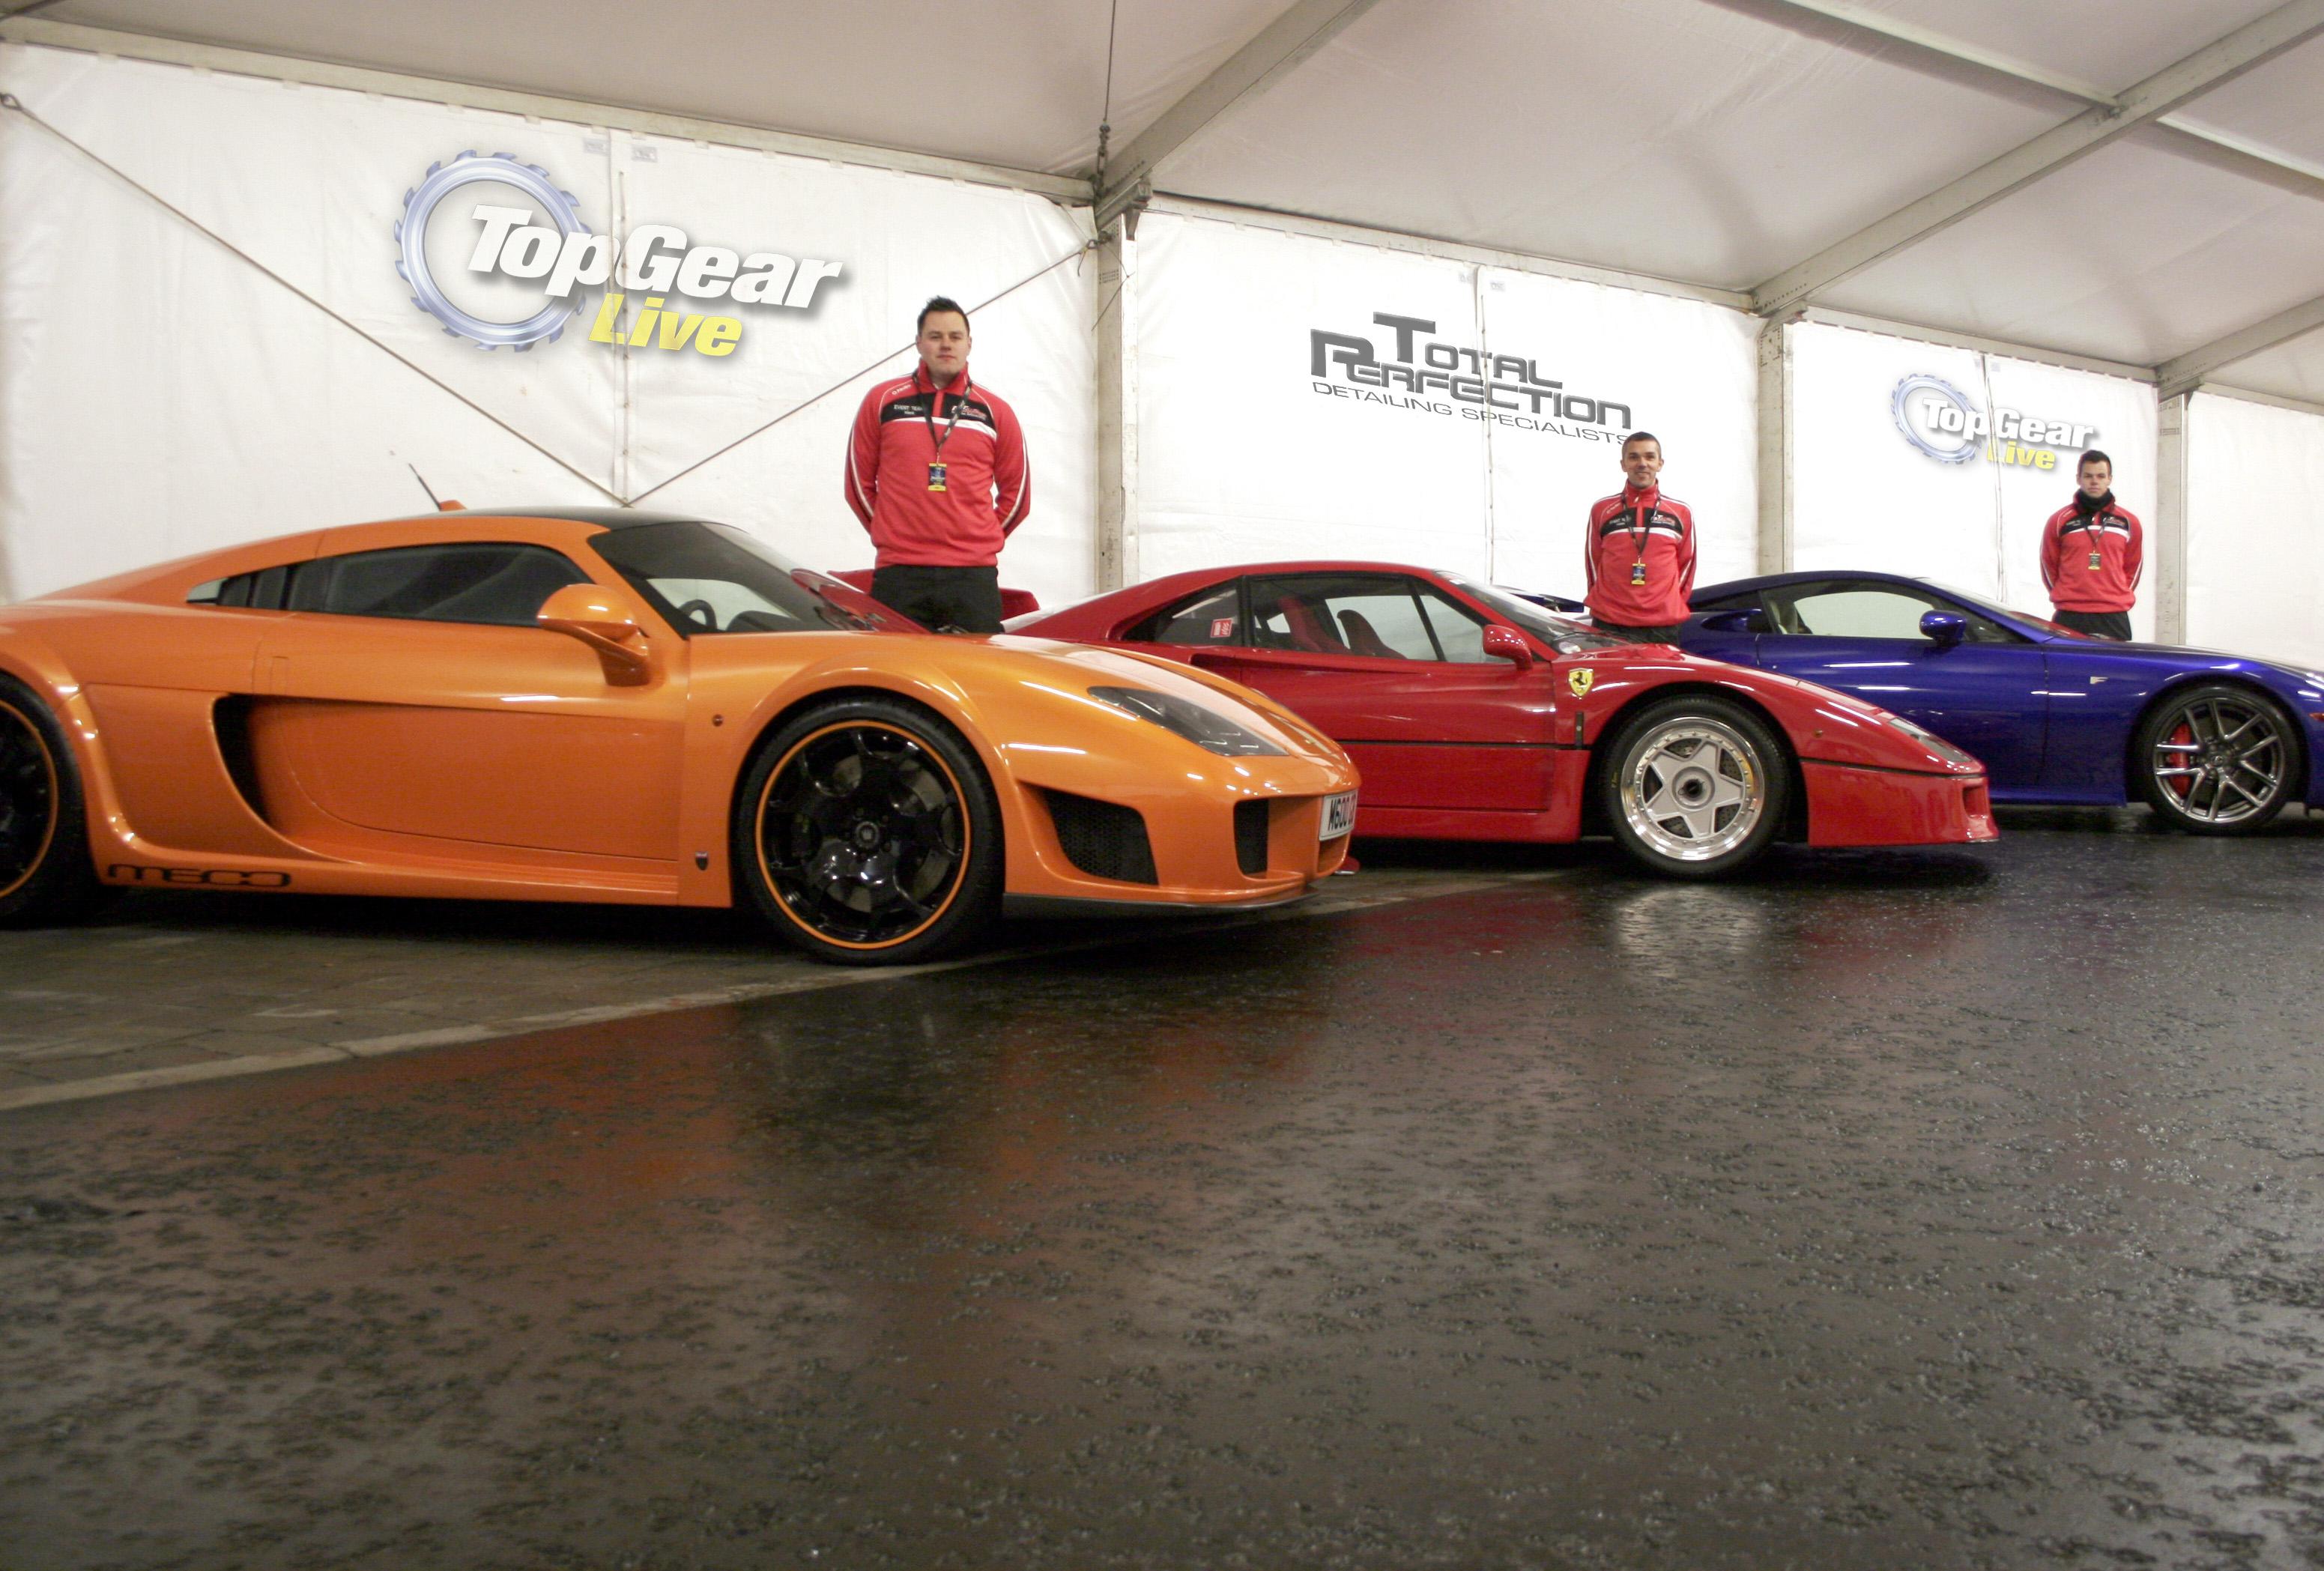 NI company adds shine to Top Gear Live